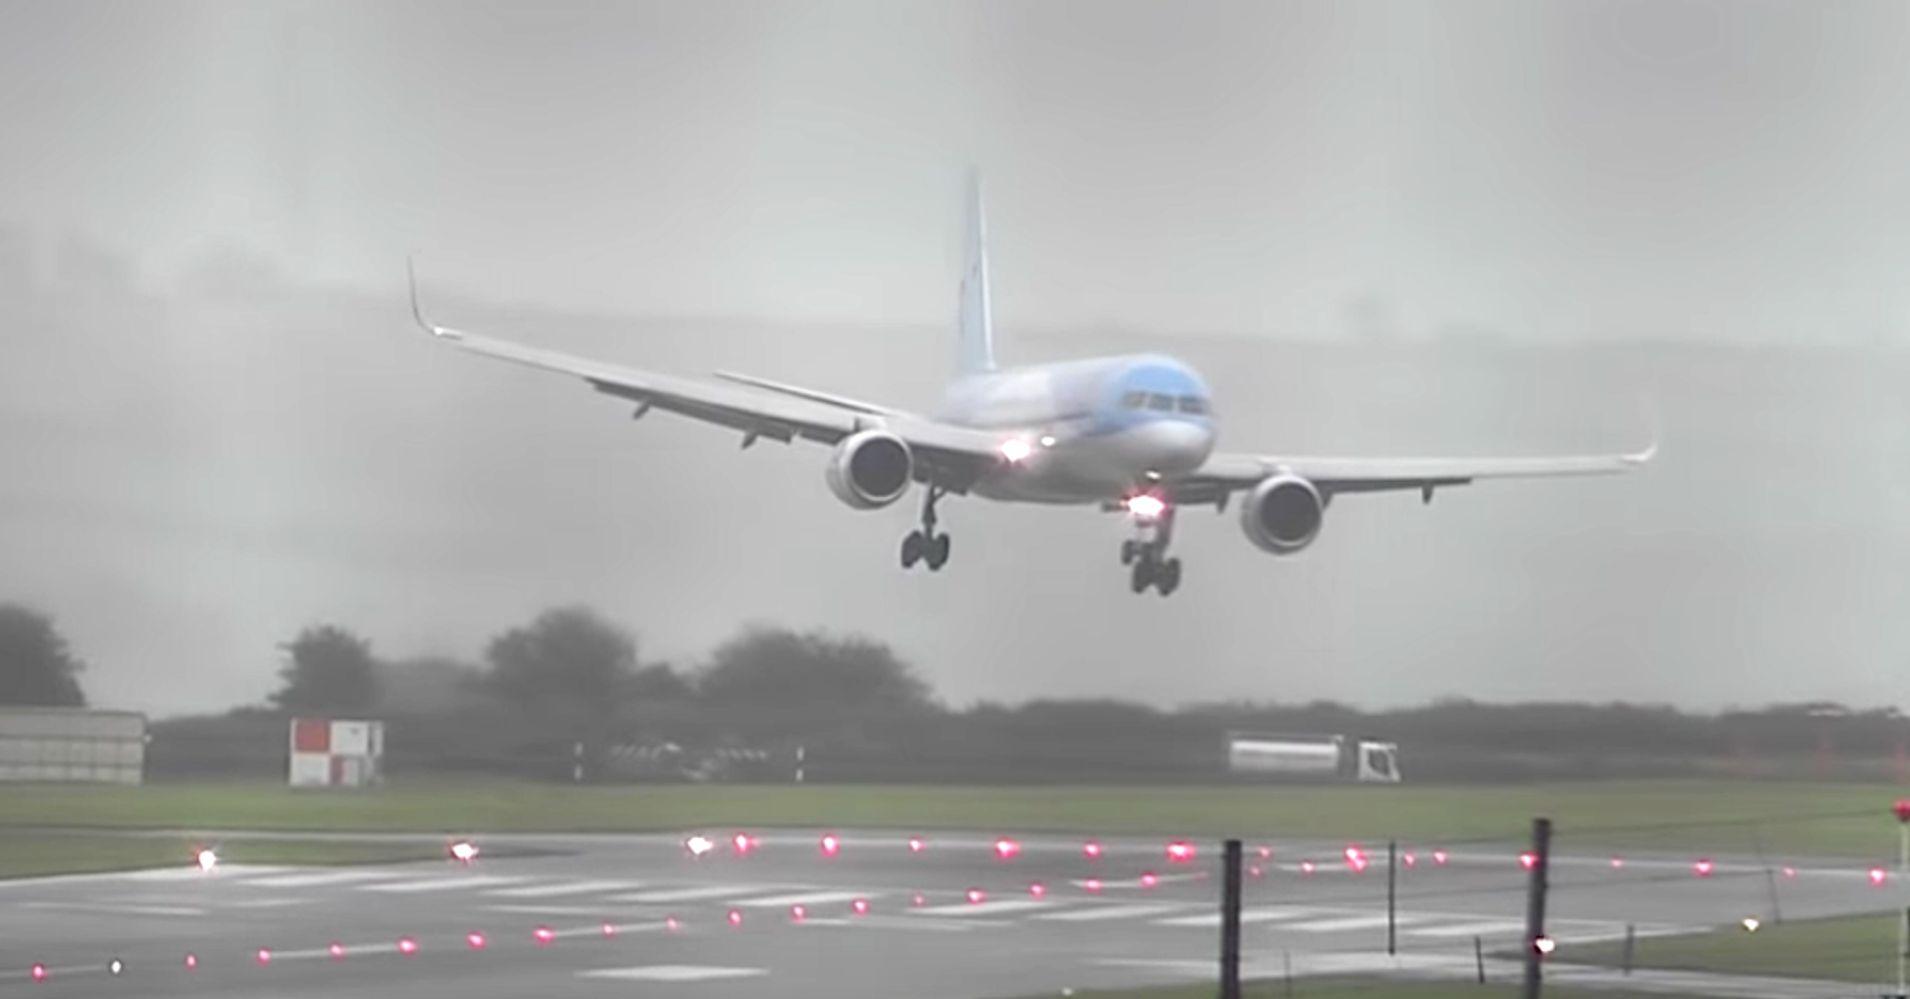 TUI Airways Lauds Pilot's 'Impressive' Sideways Landing In Stiff Crosswind